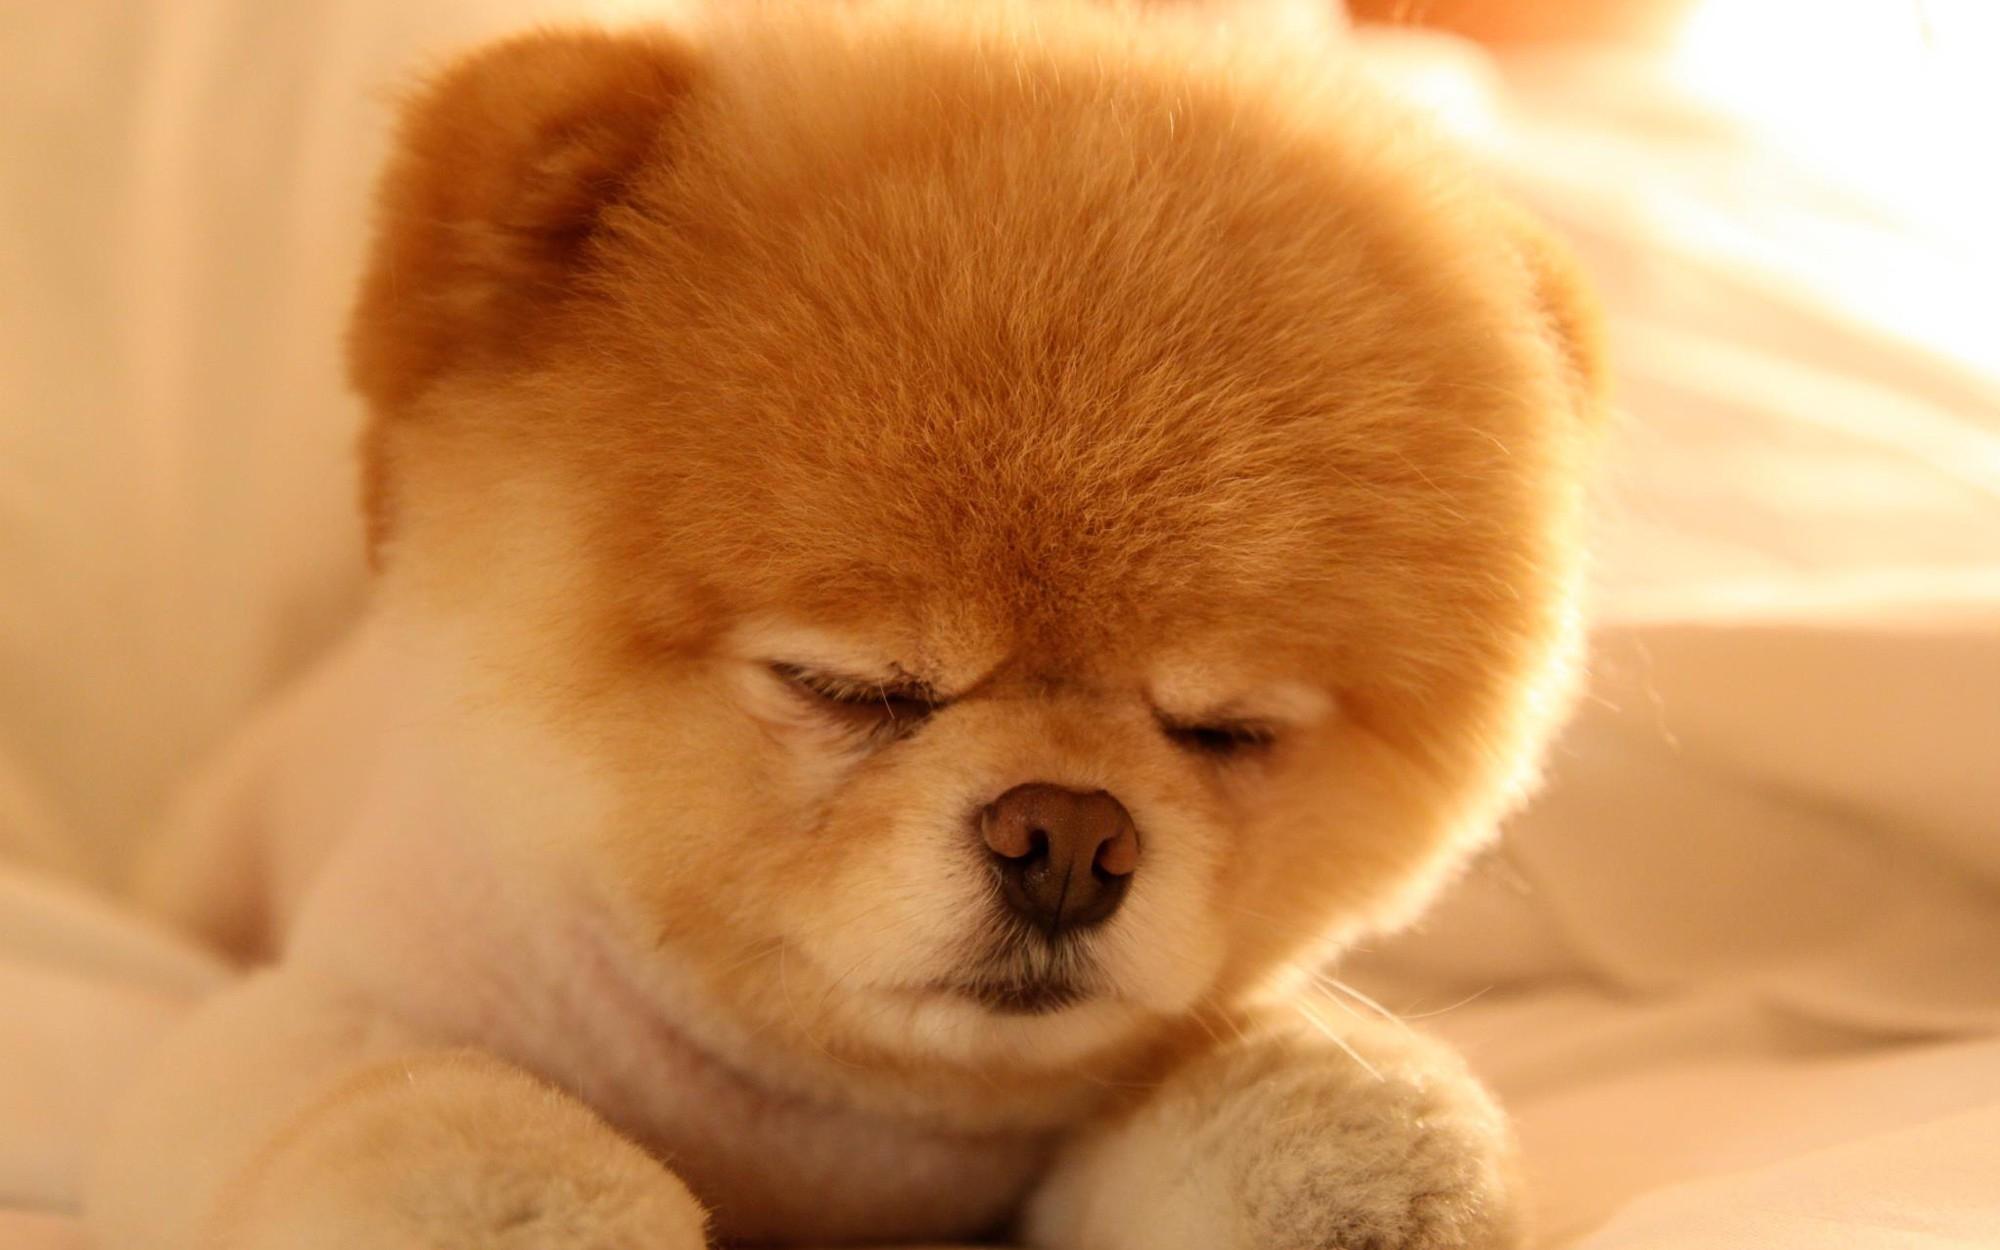 de pantalla el perro hermoso boo hd widescreen Gratis imagenes 9985 2000x1250